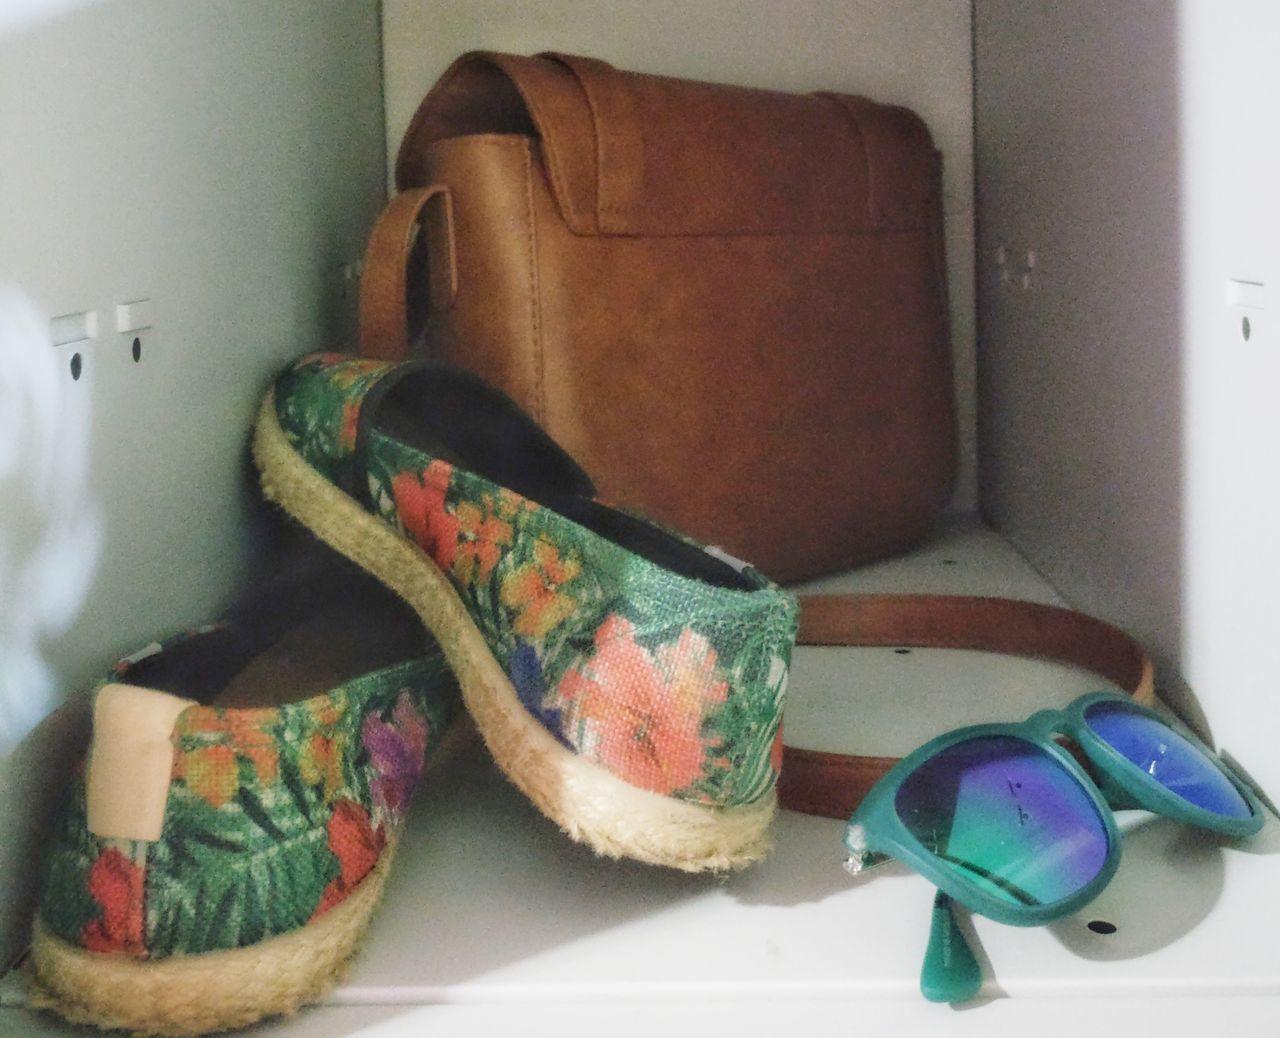 Bodegón preveranil Locker Summertime Verano Summeriscoming Shoes Sunglasses Bag Mystuff Belongings